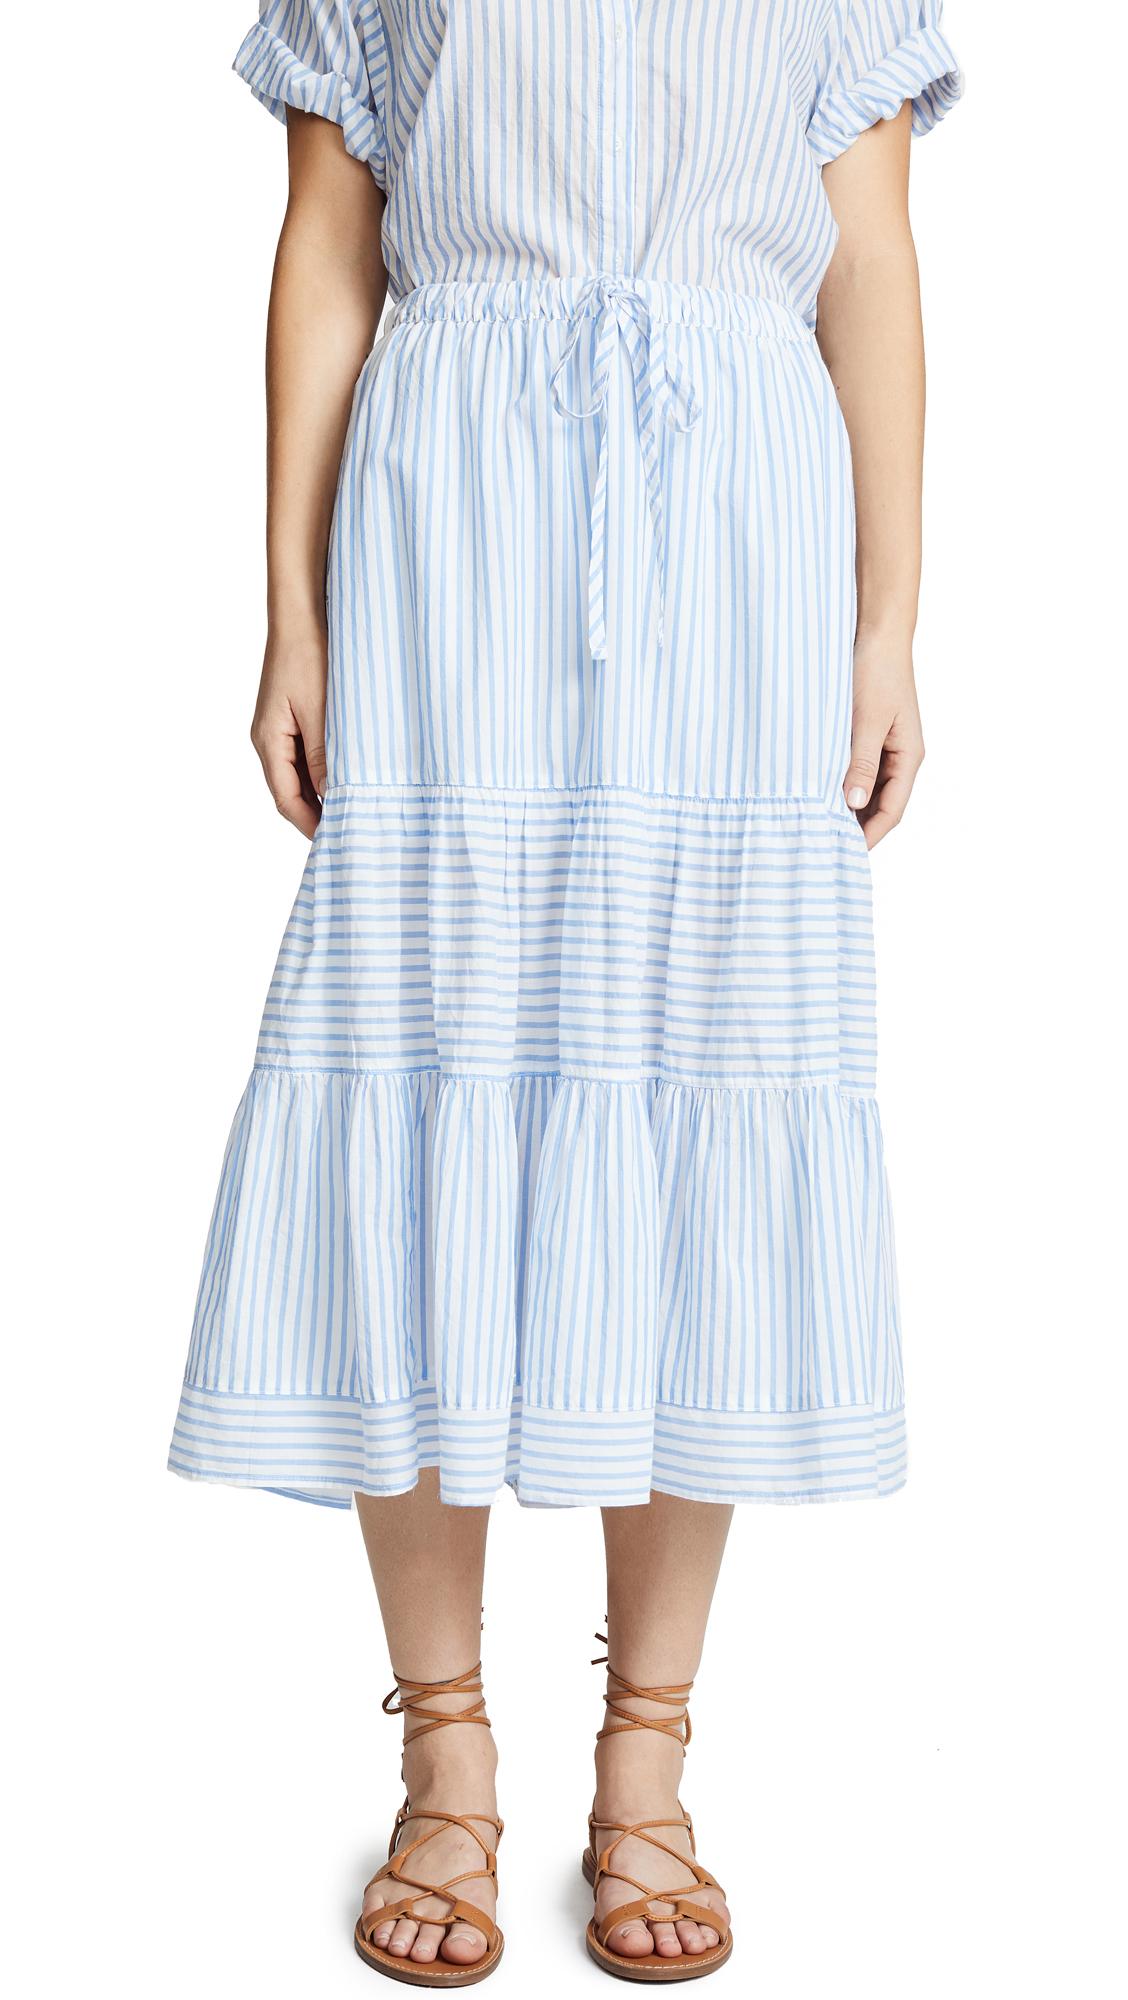 XIRENA Malone Skirt In Pacific Blue